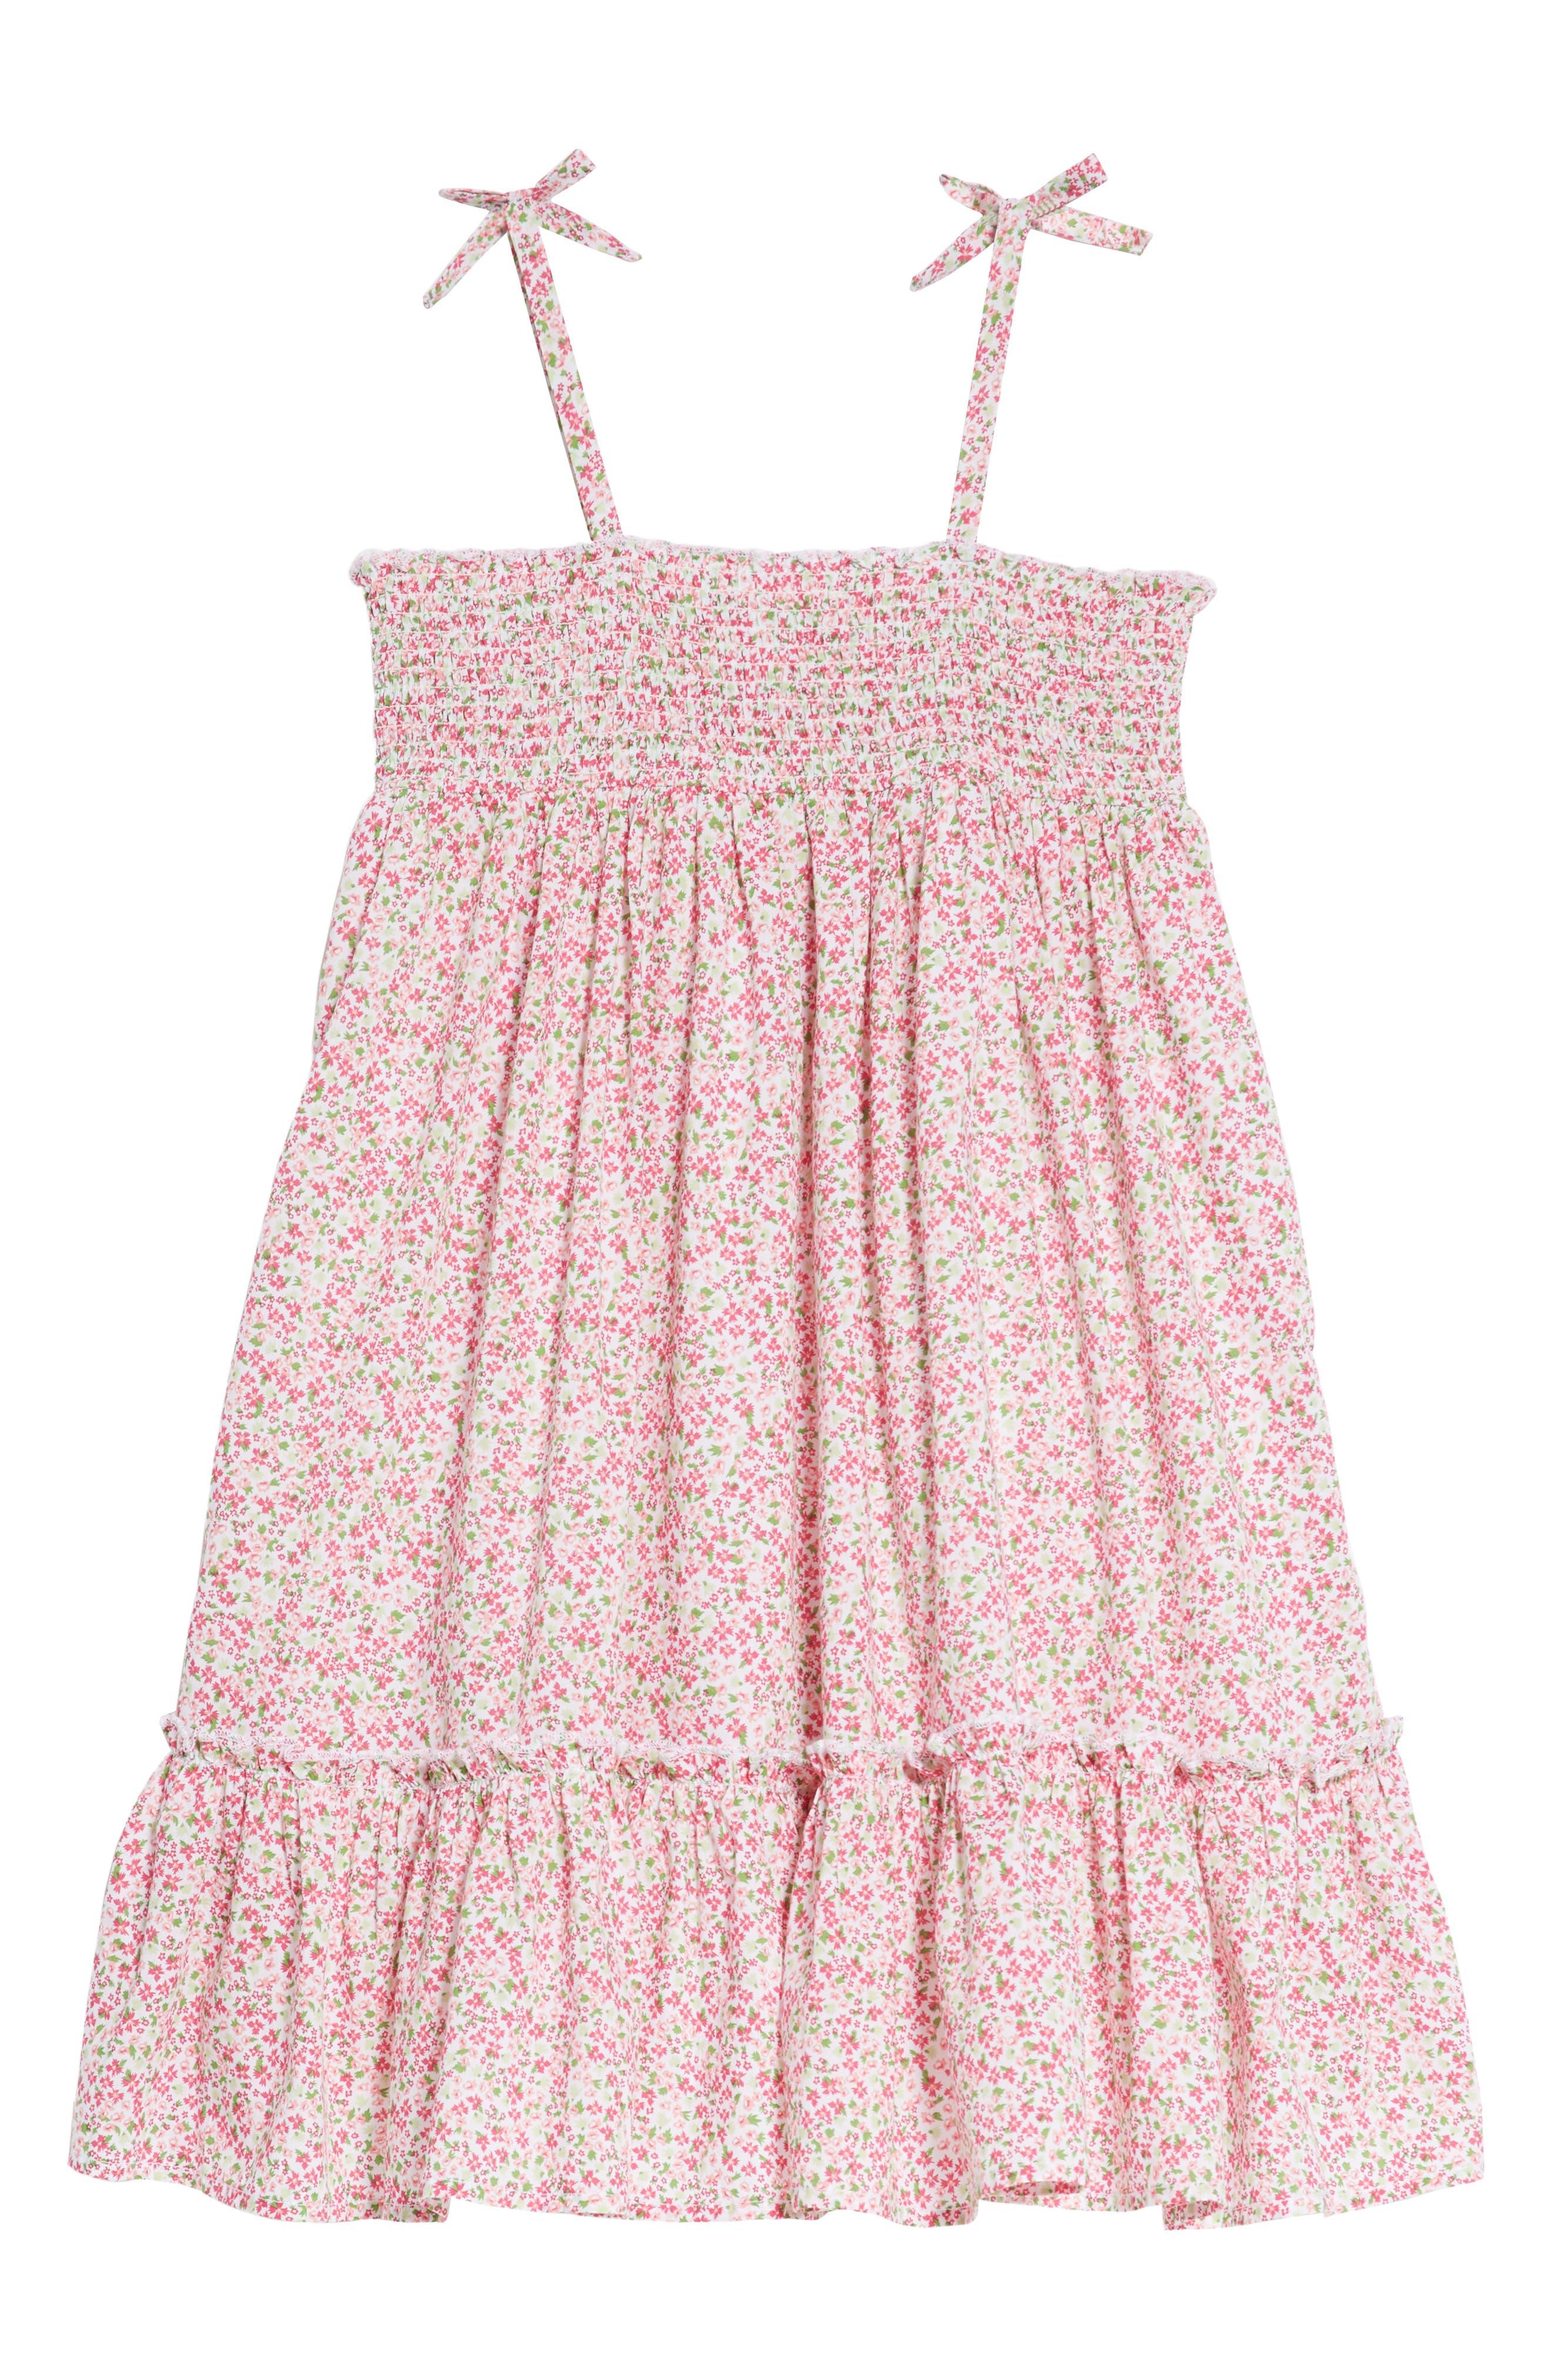 Smocked Ditzy Dress,                             Alternate thumbnail 2, color,                             White- Pink Dense Floral